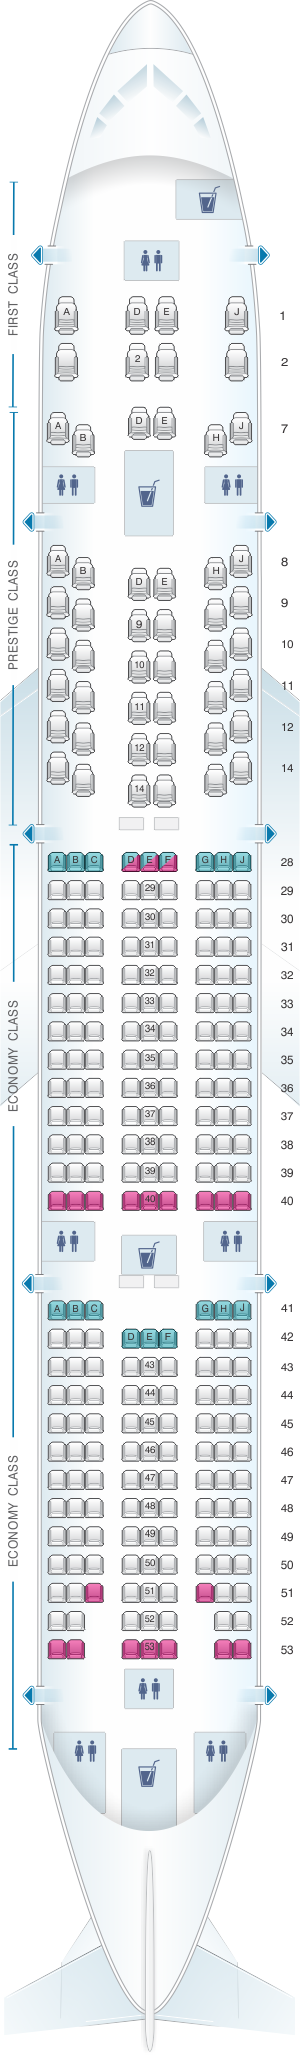 Seat map for Korean Air Boeing B777 300ER 277PAX